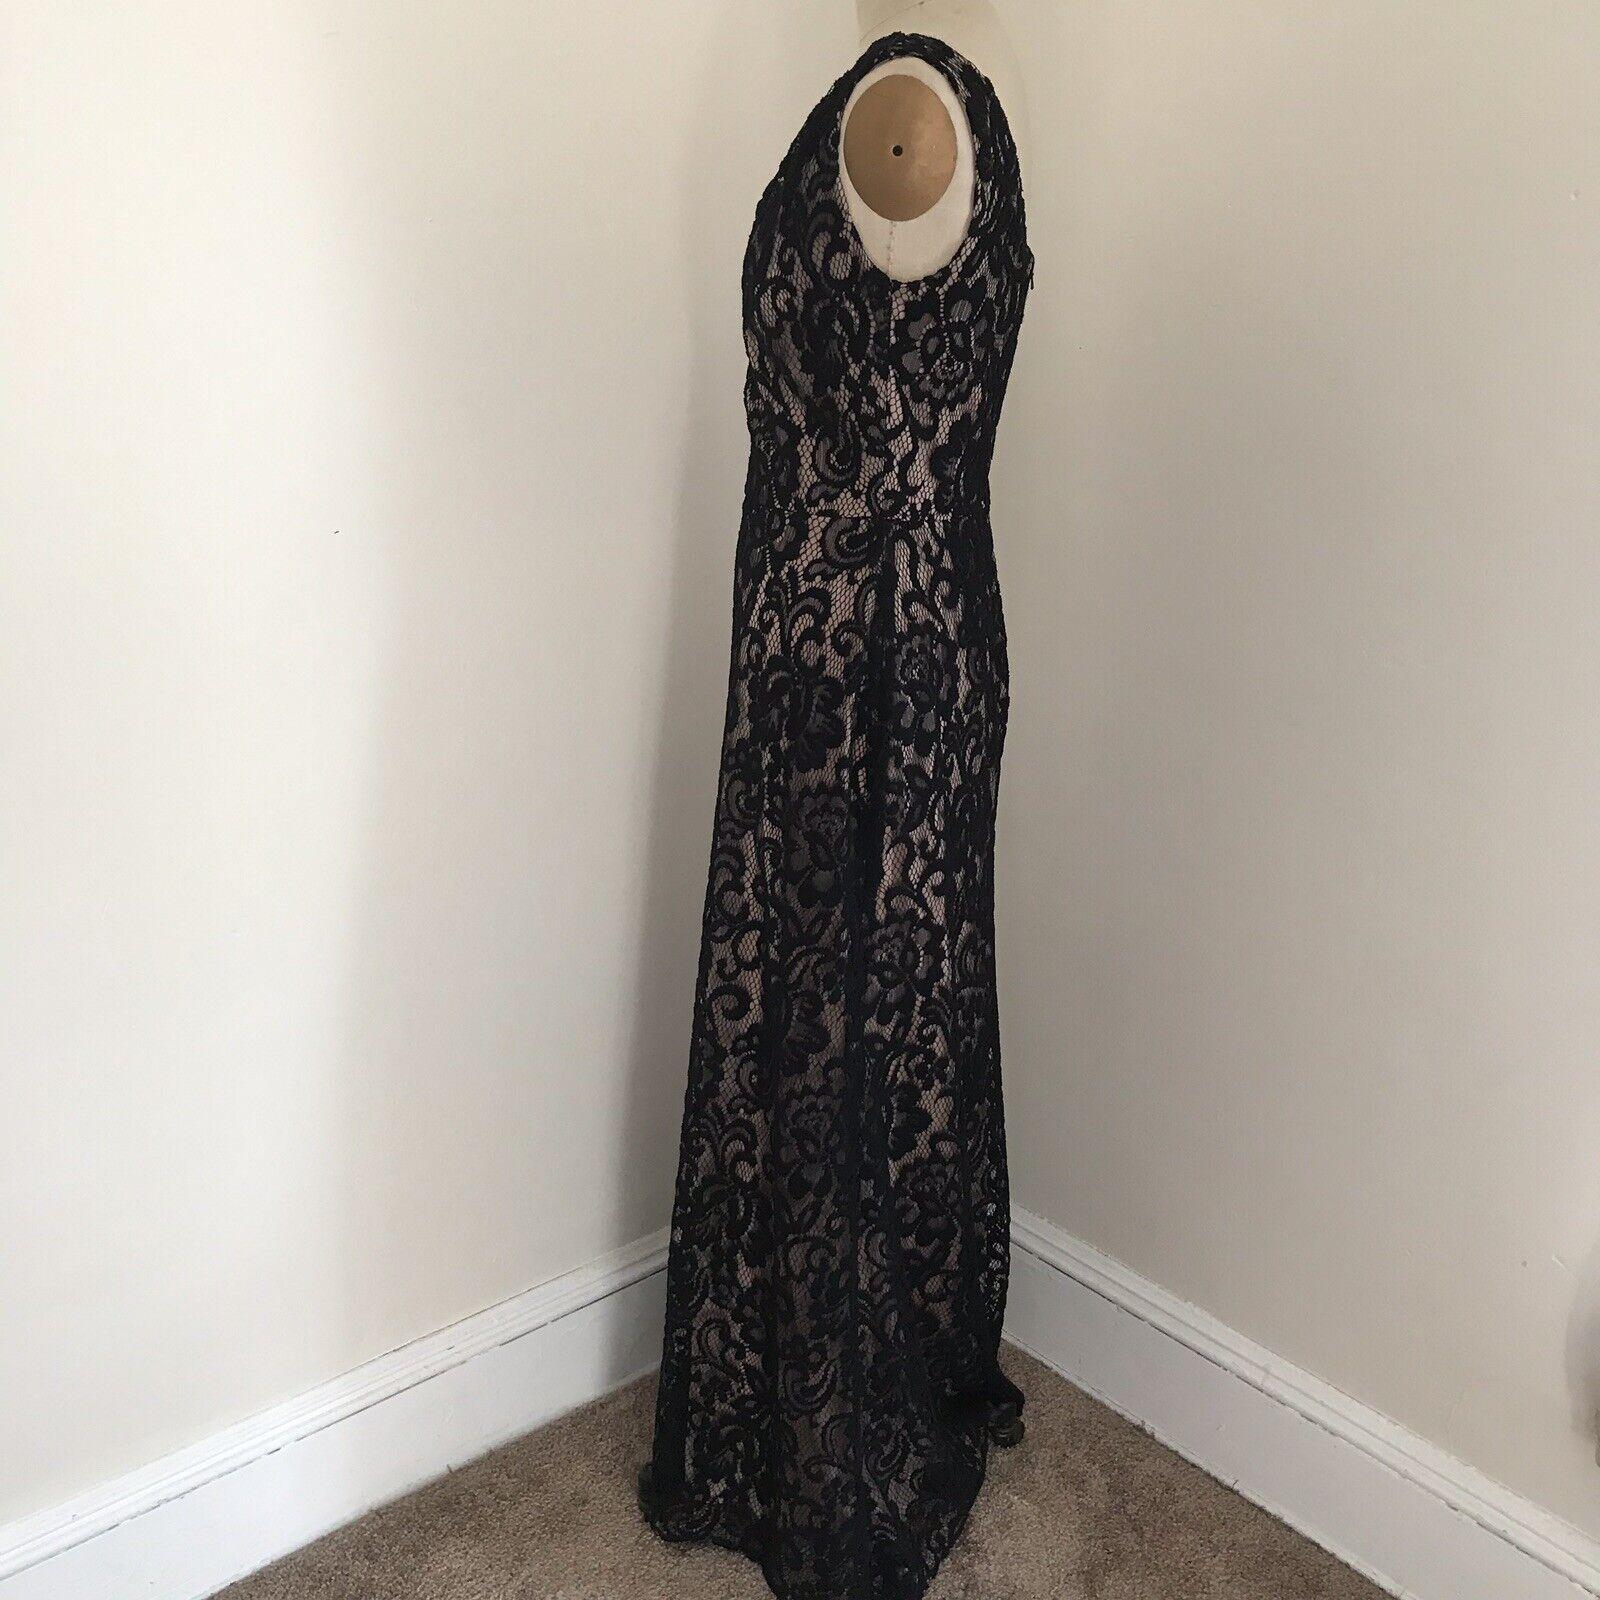 Dessy Collection Gown Black Lace One Shoulder Dre… - image 3